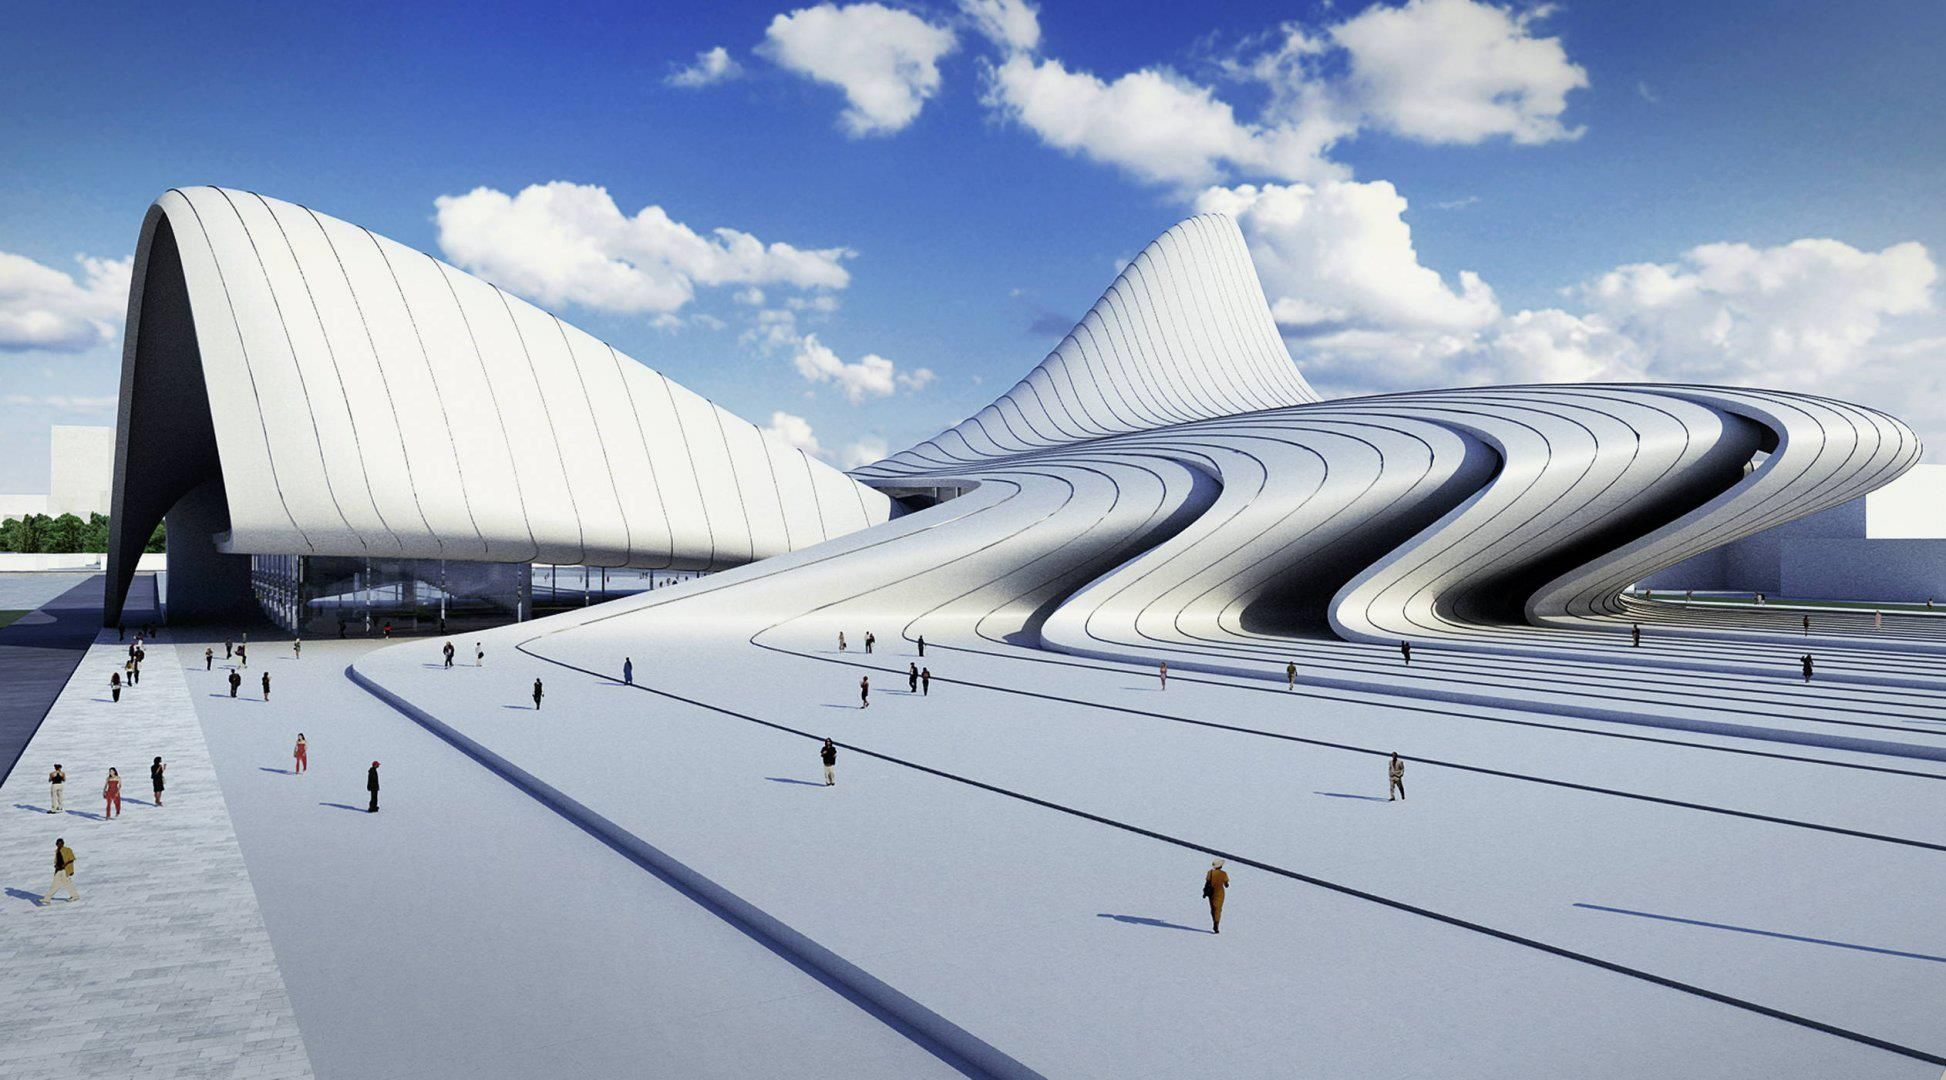 Heydar Aliyev Centre Baku Azerbaijan C Zaha Hadid Architects Zaha Hadid Zaha Hadid Design Zaha Hadid Architecture